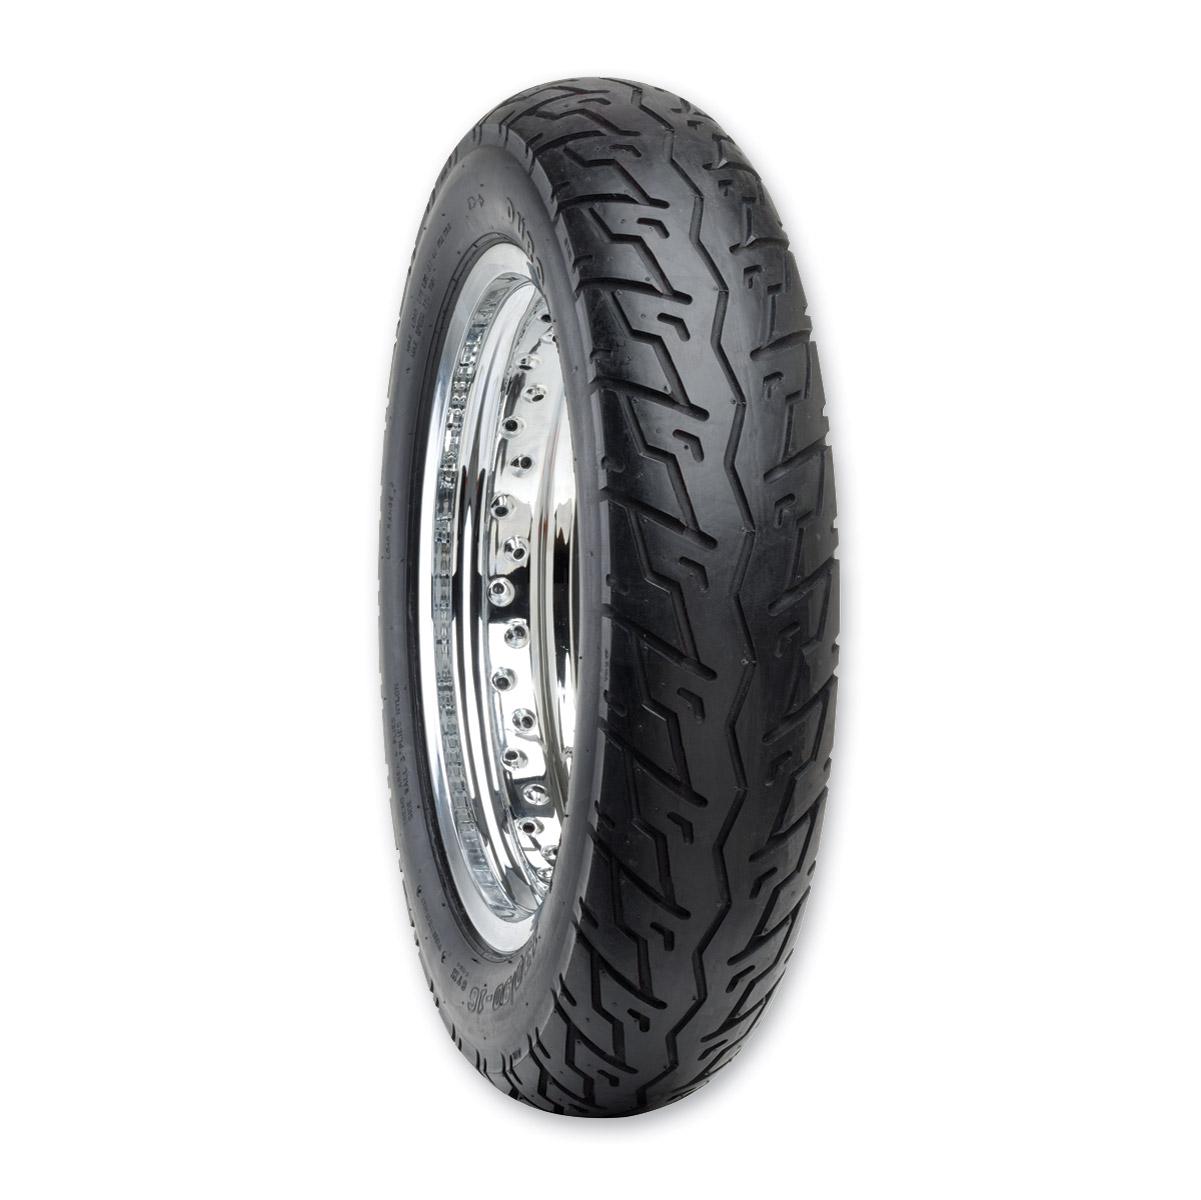 Duro Excursion 100/90-19 Front/Rear Tire